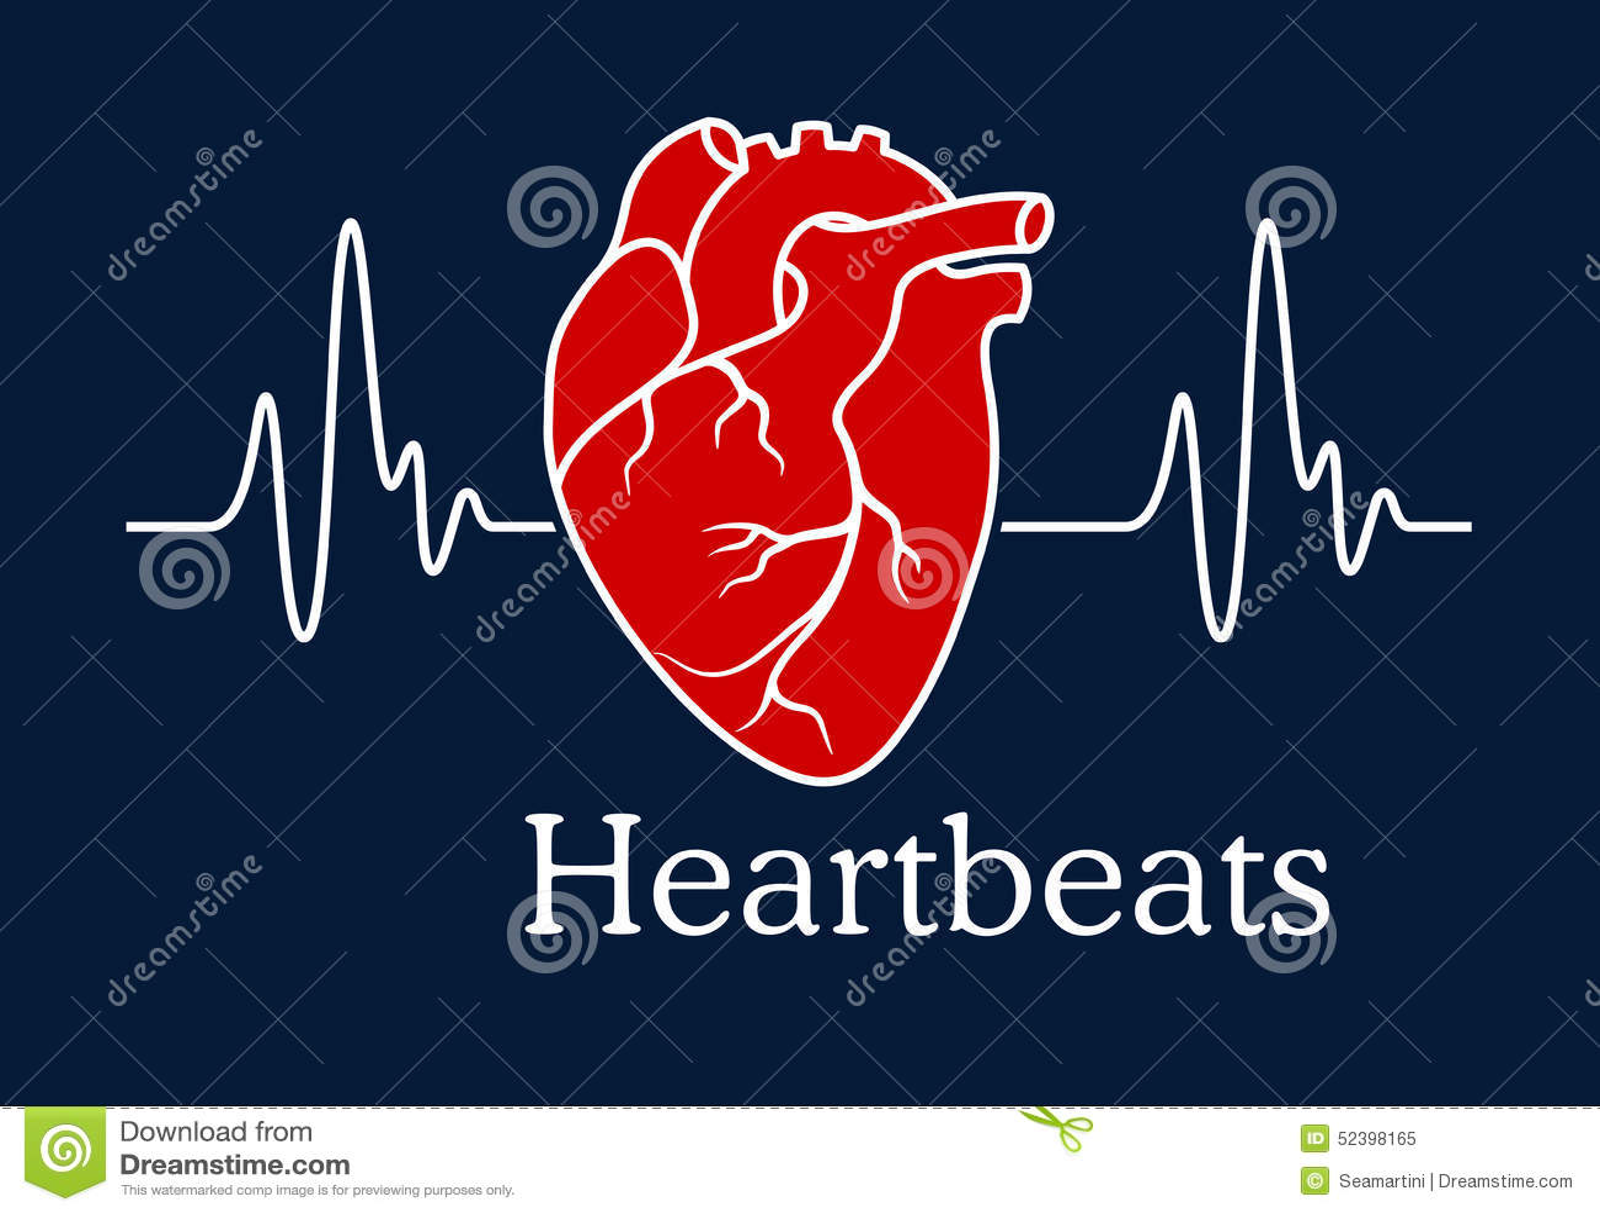 Human heart with white heartbeats cardiogram